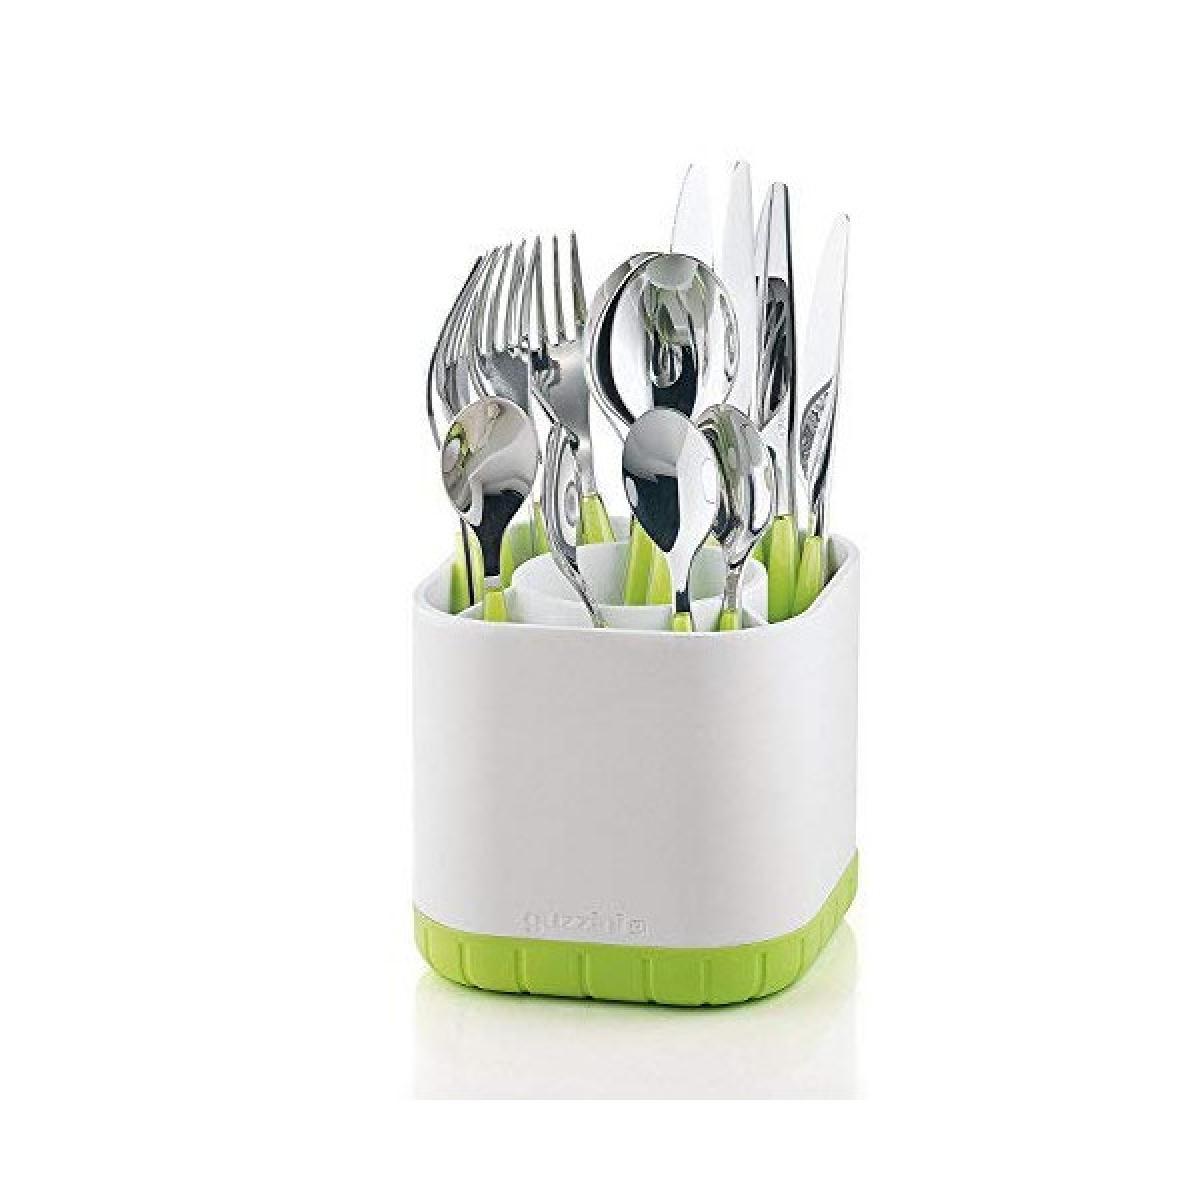 Guzzini GUZZINI Egouttoir à couverts vert 'My Kitchen'